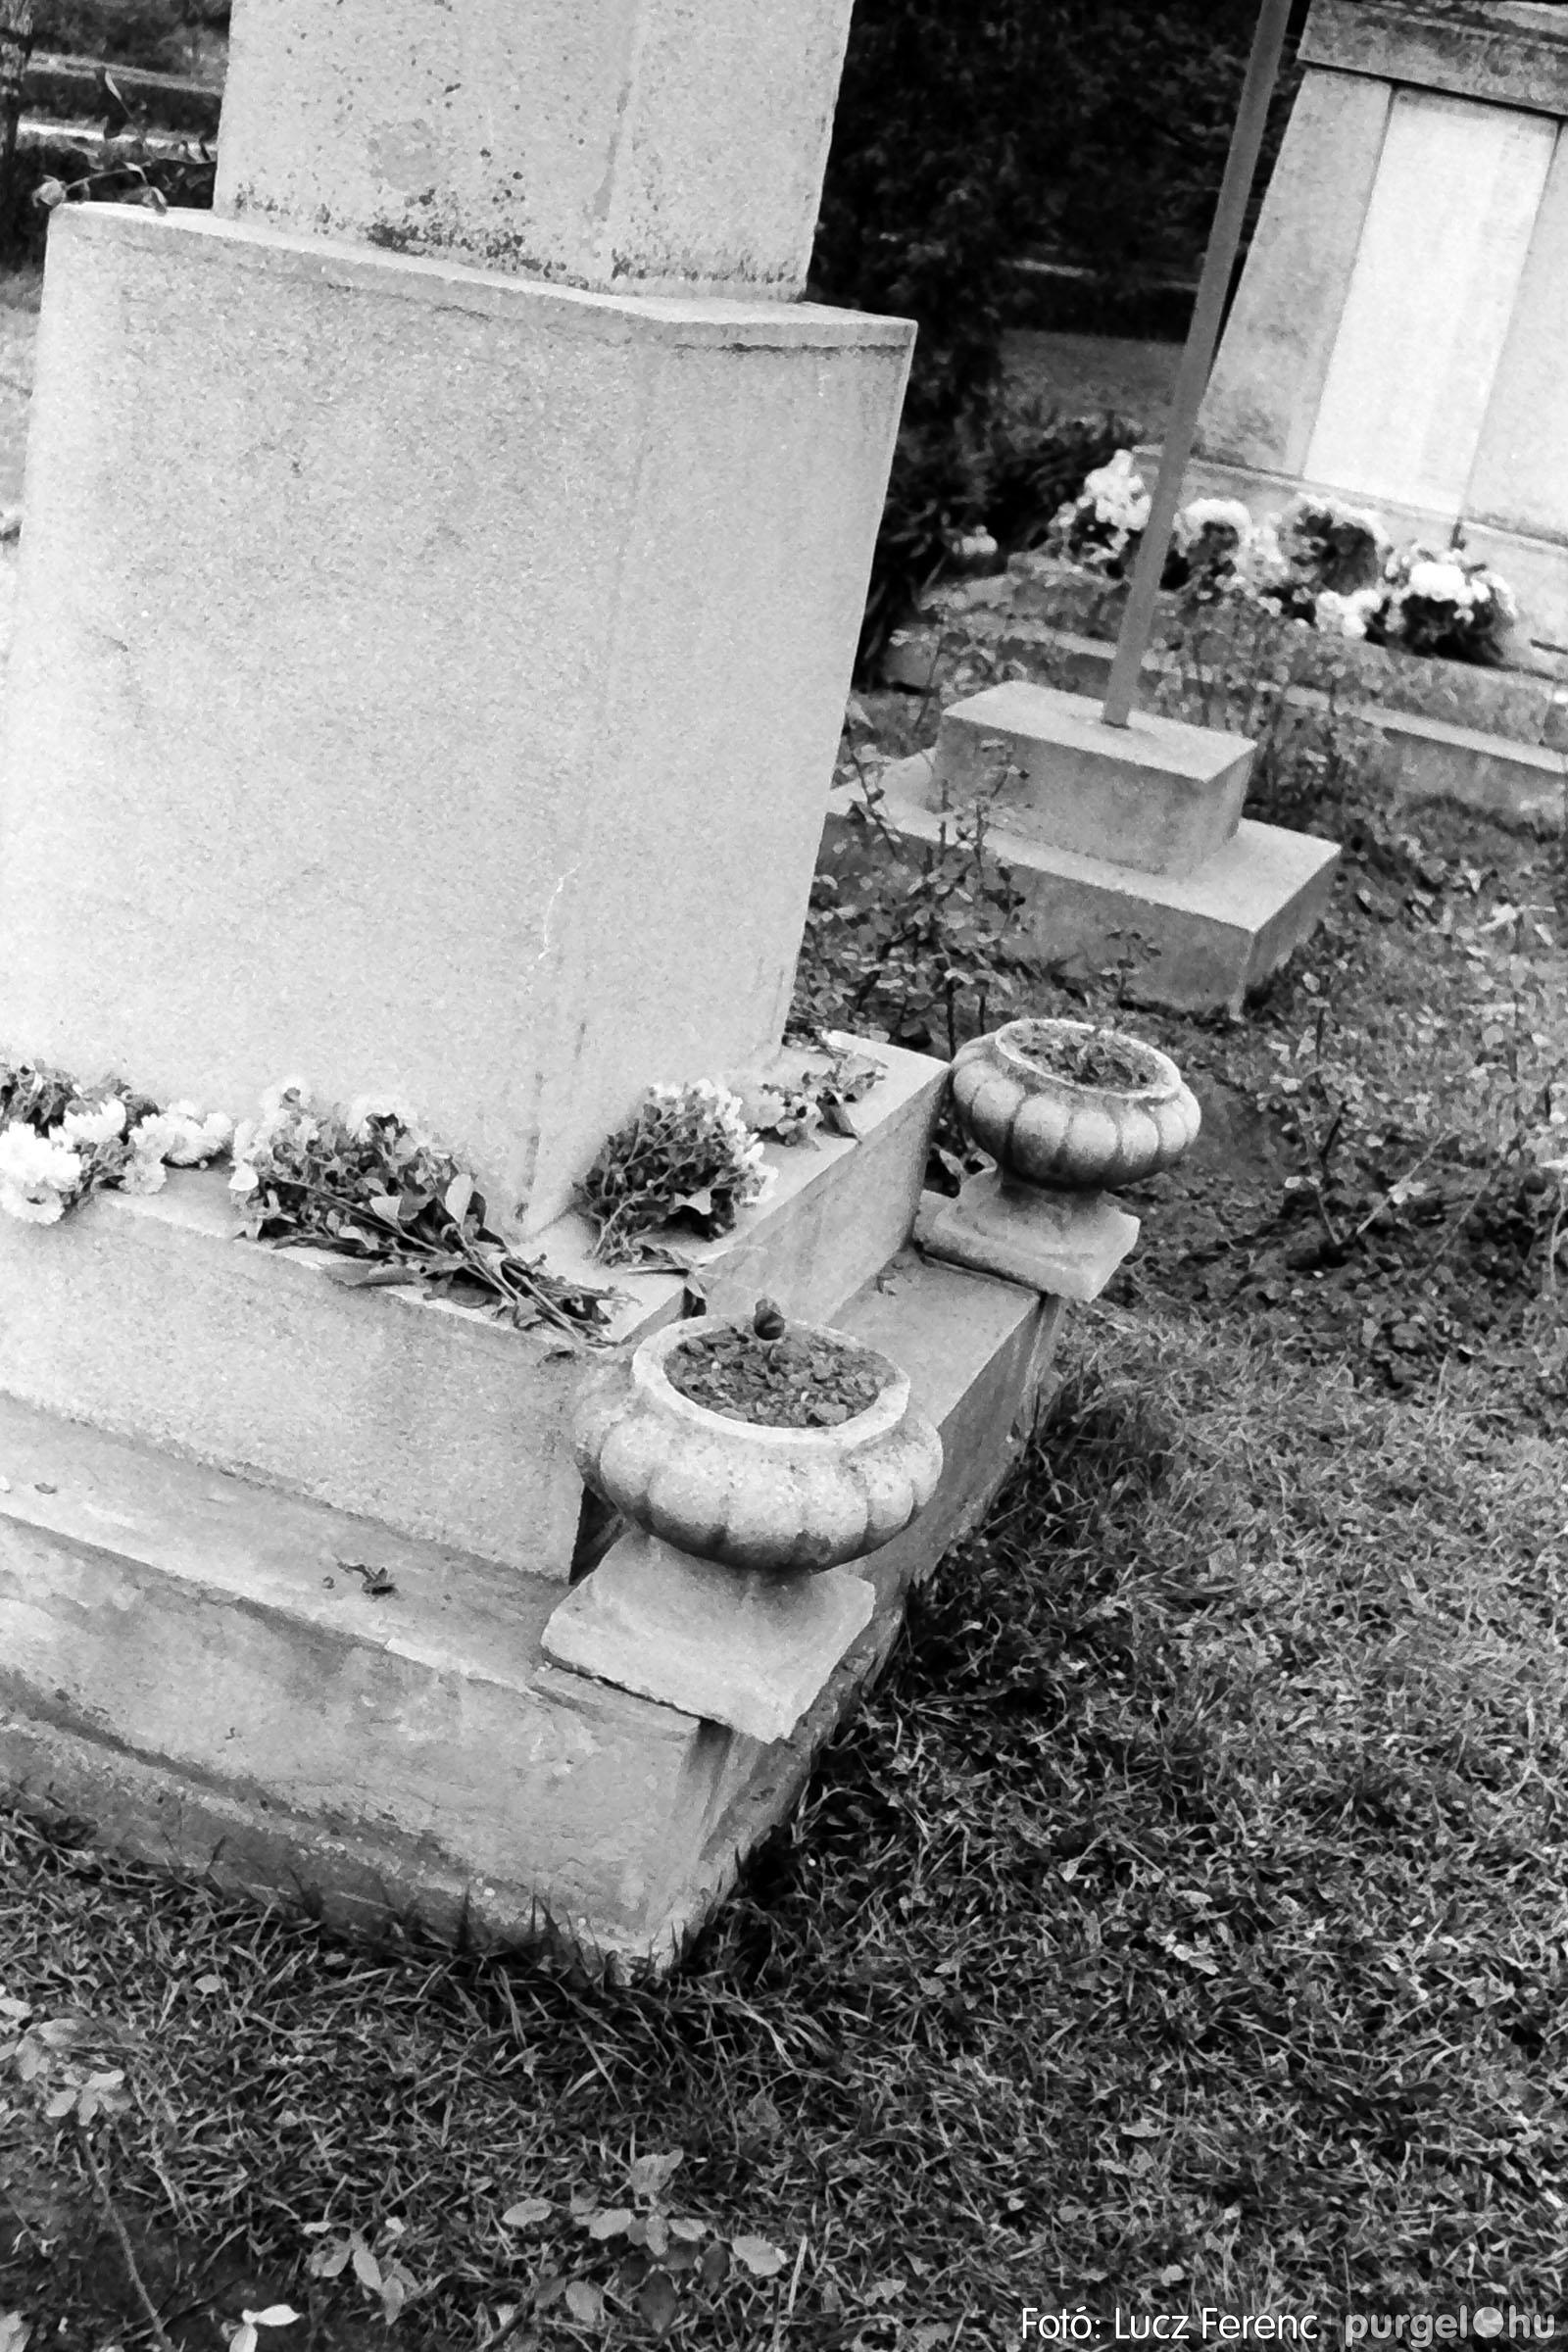 025 1975.10. Szovjet katonai emlékmű 002 - Fotó: Lucz Ferenc IMG00230q.jpg